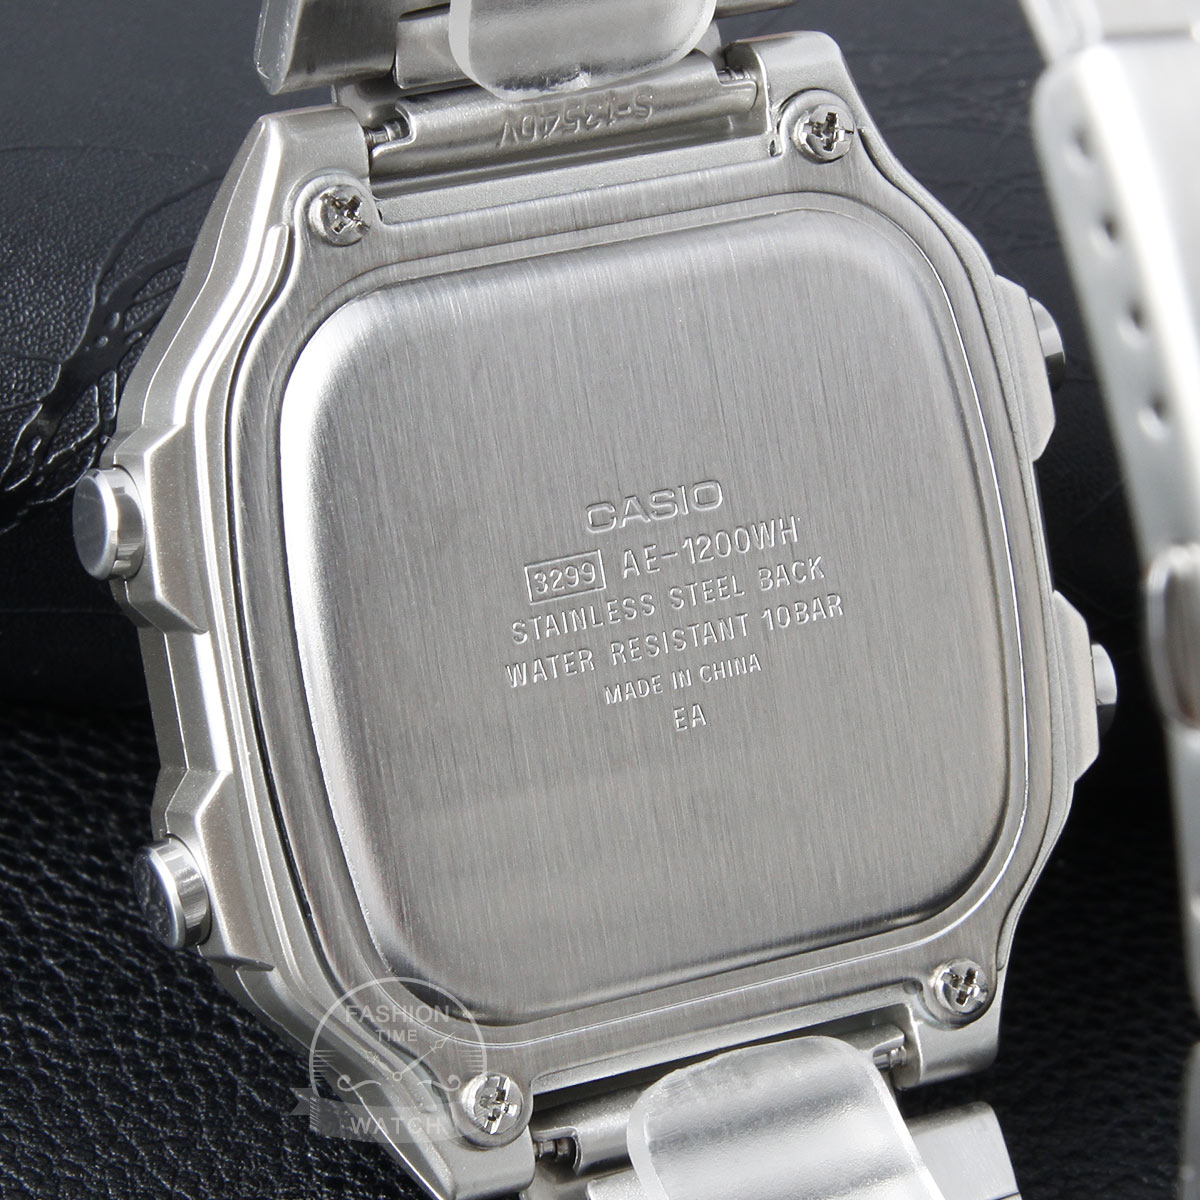 Casio watch Explosion watch men set luxury LED military digital watch sport quartz men watch relogio masculinoAE-1200WHD-1A enlarge